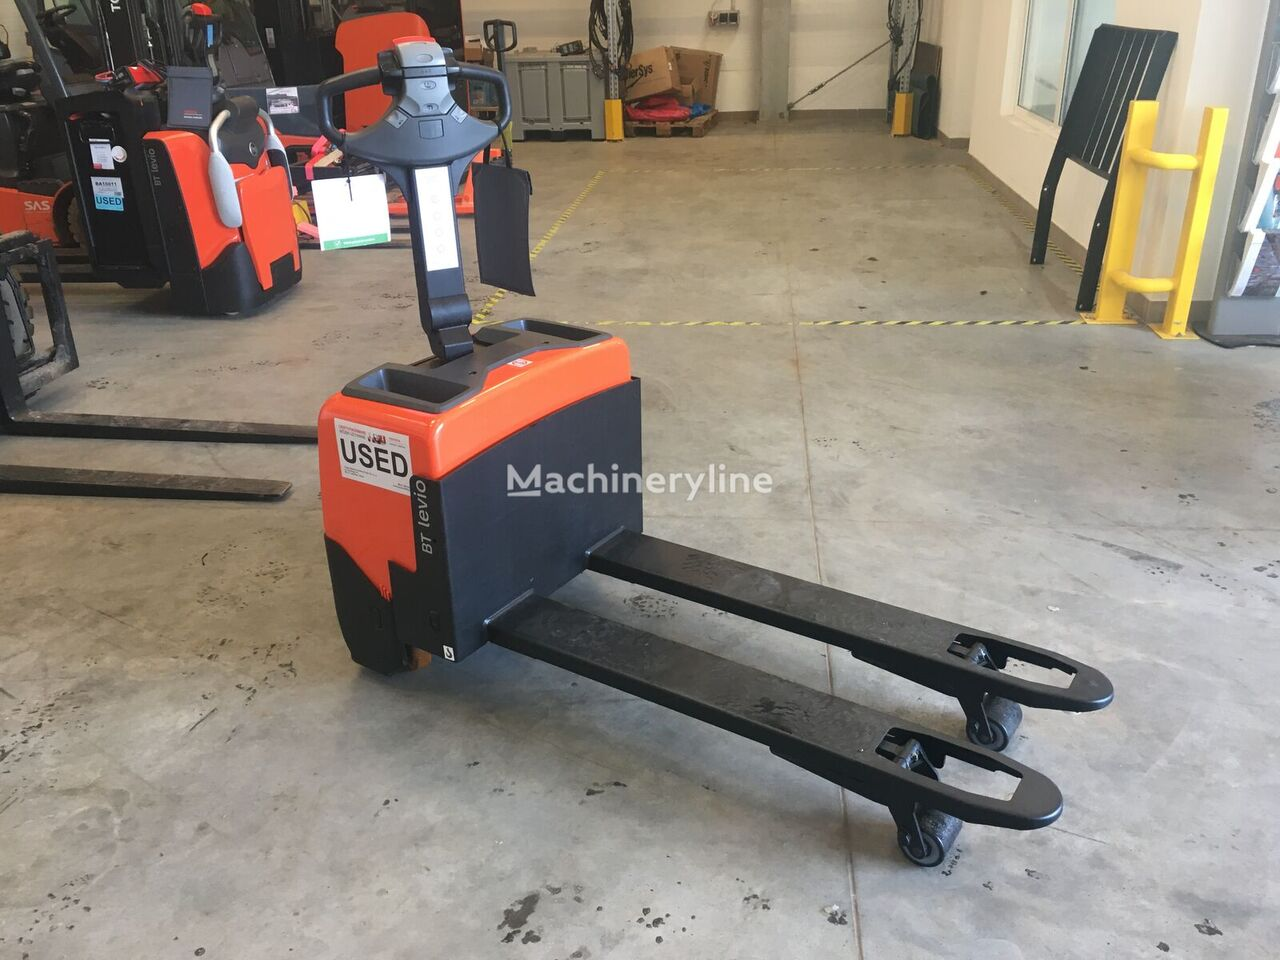 BT LWE130 electric pallet truck